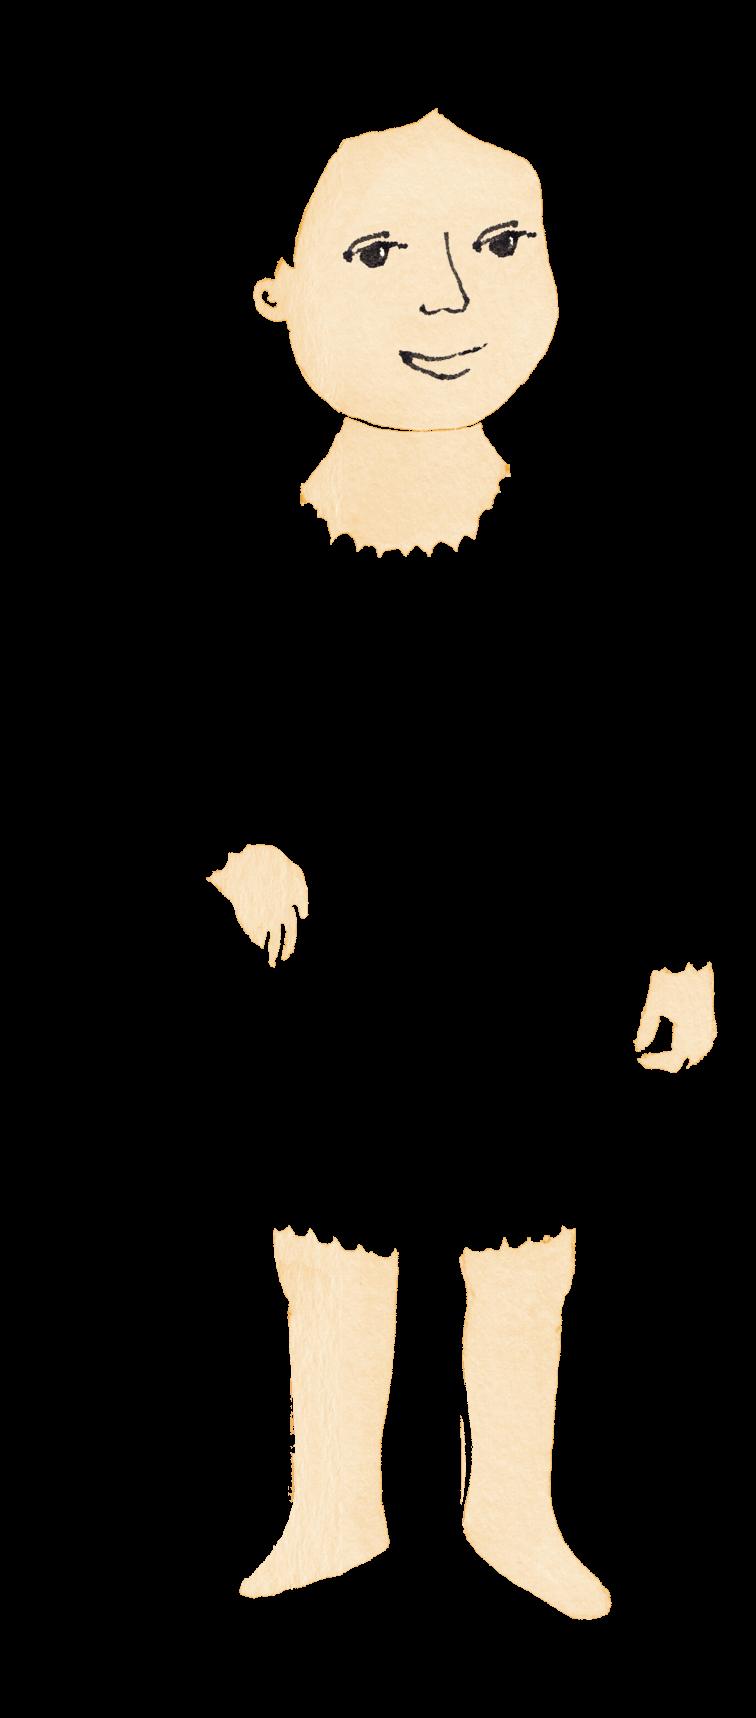 bőrszín